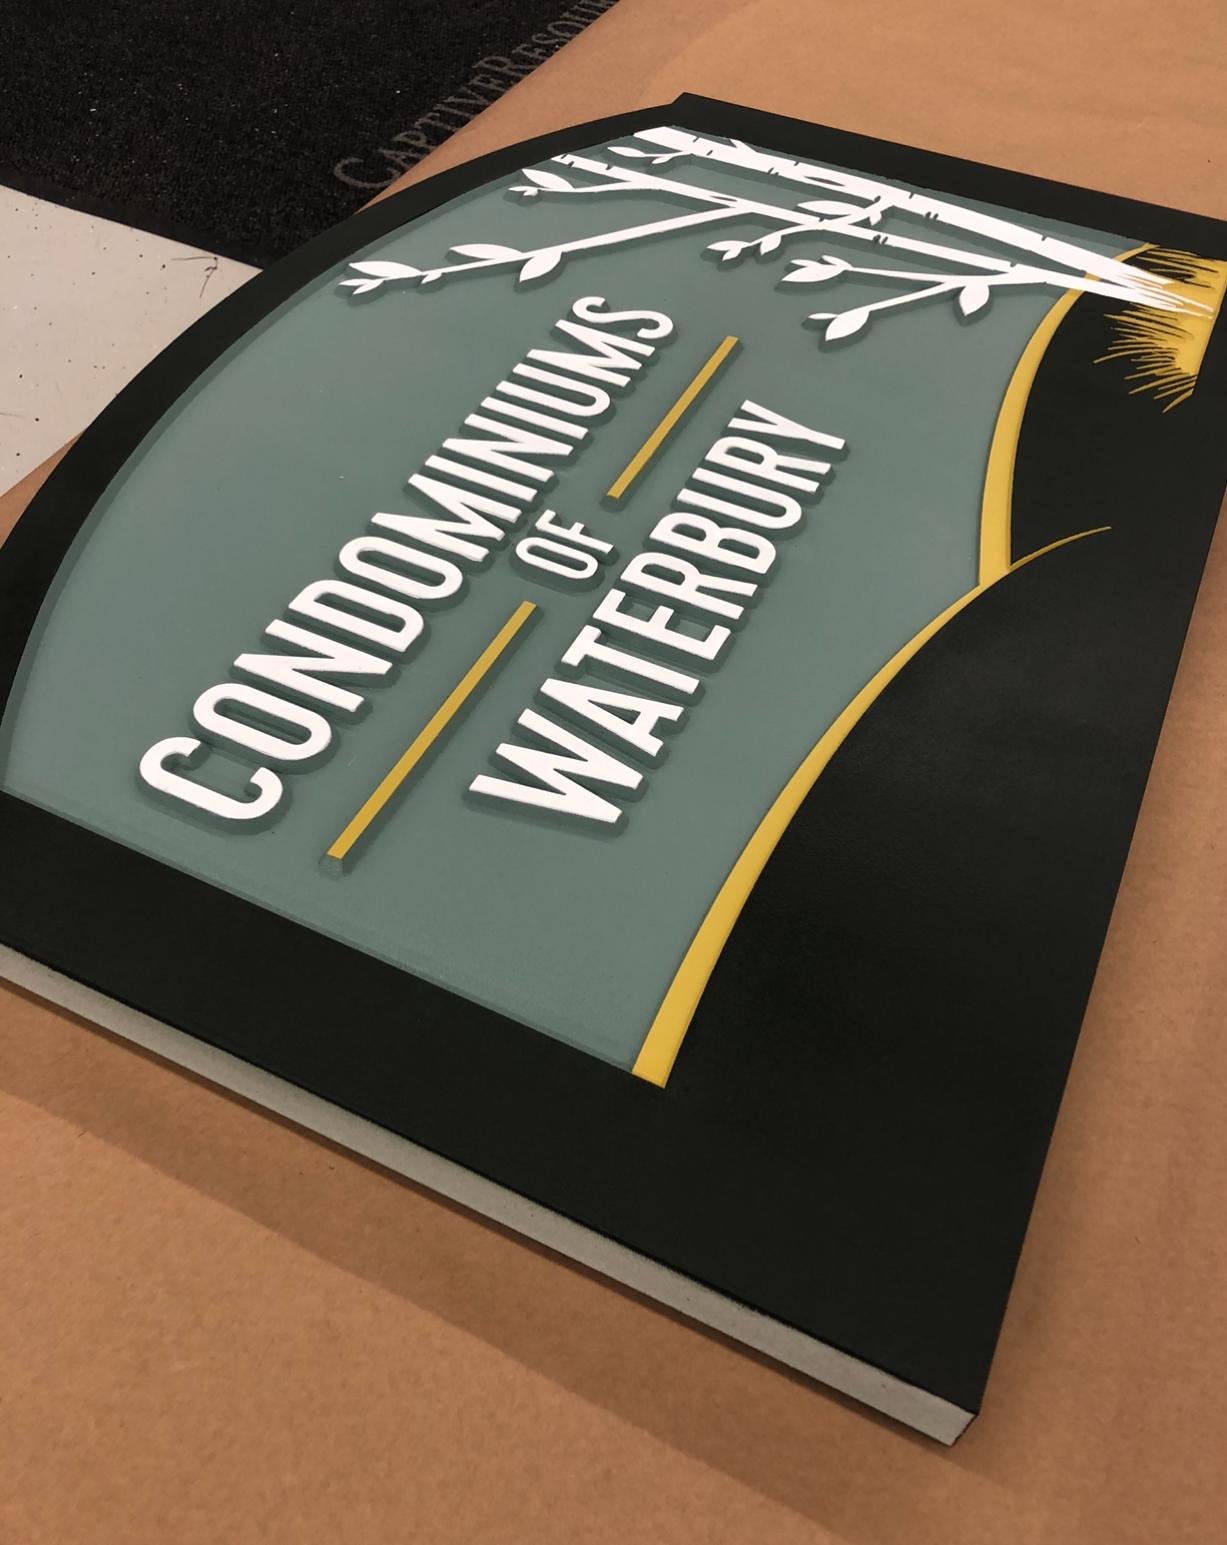 Condominiums of Waterbury Colored HDU Sign